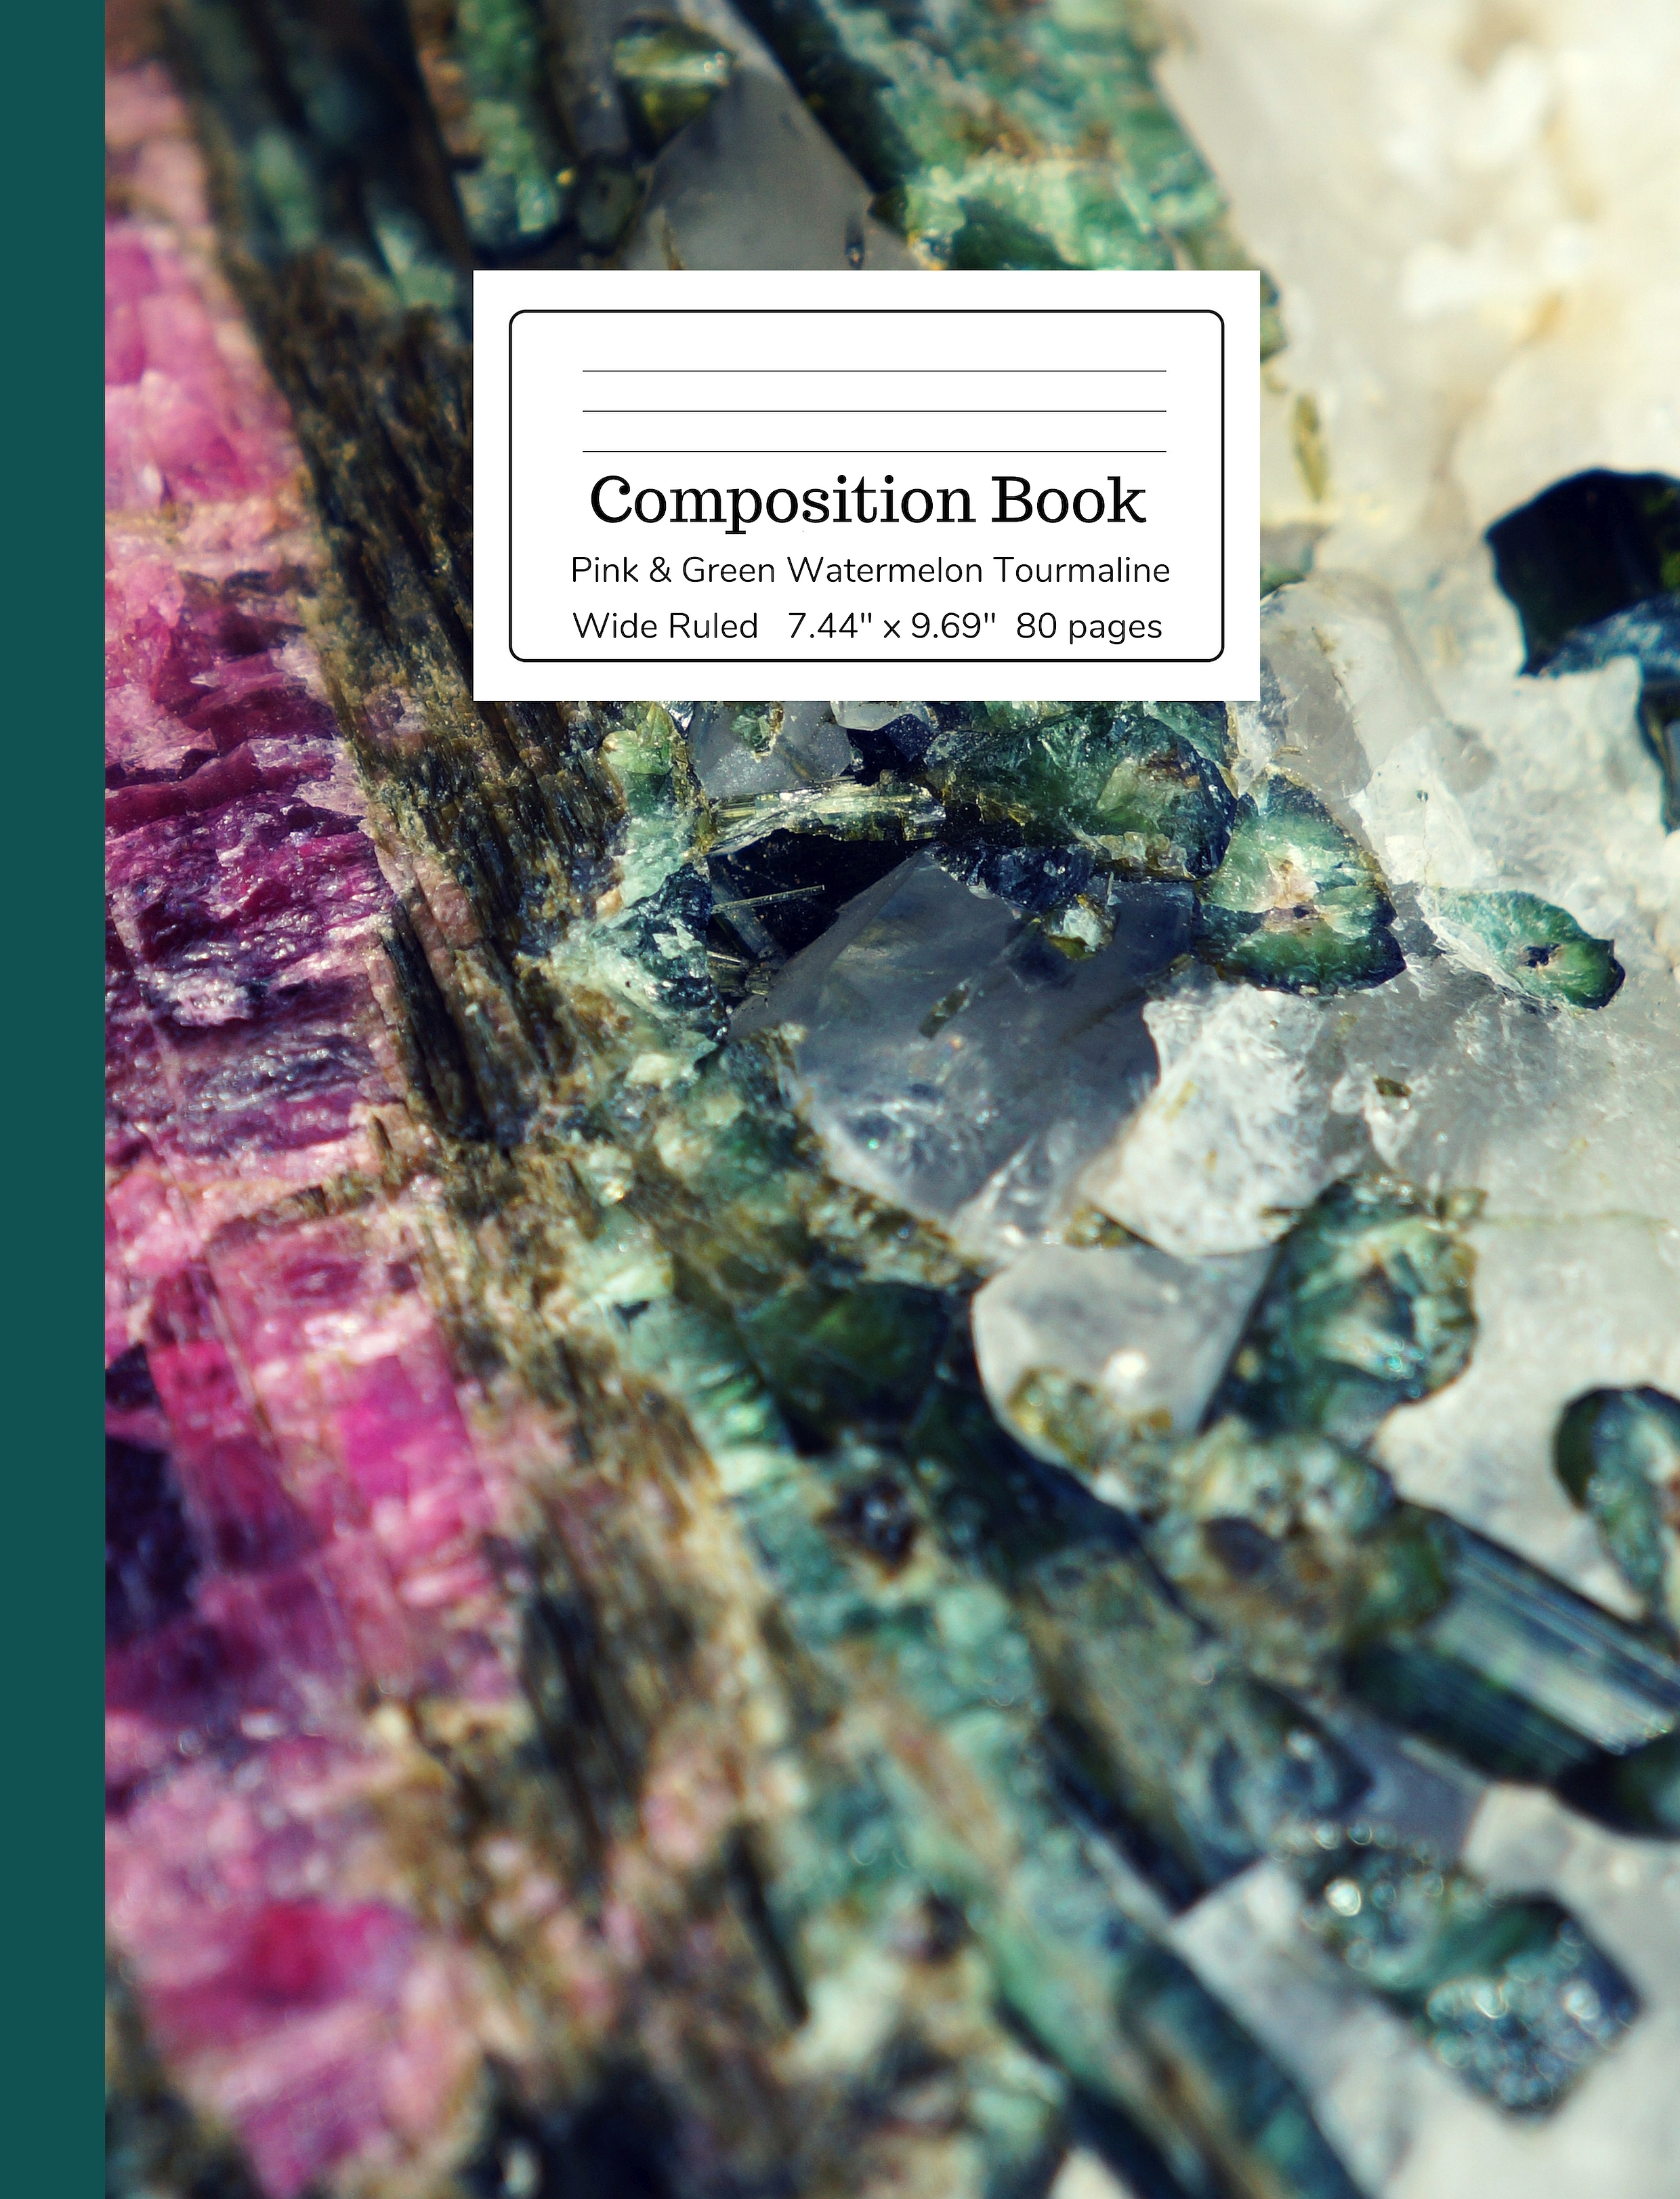 Pink & Green Watermelon Tourmaline Composition Book